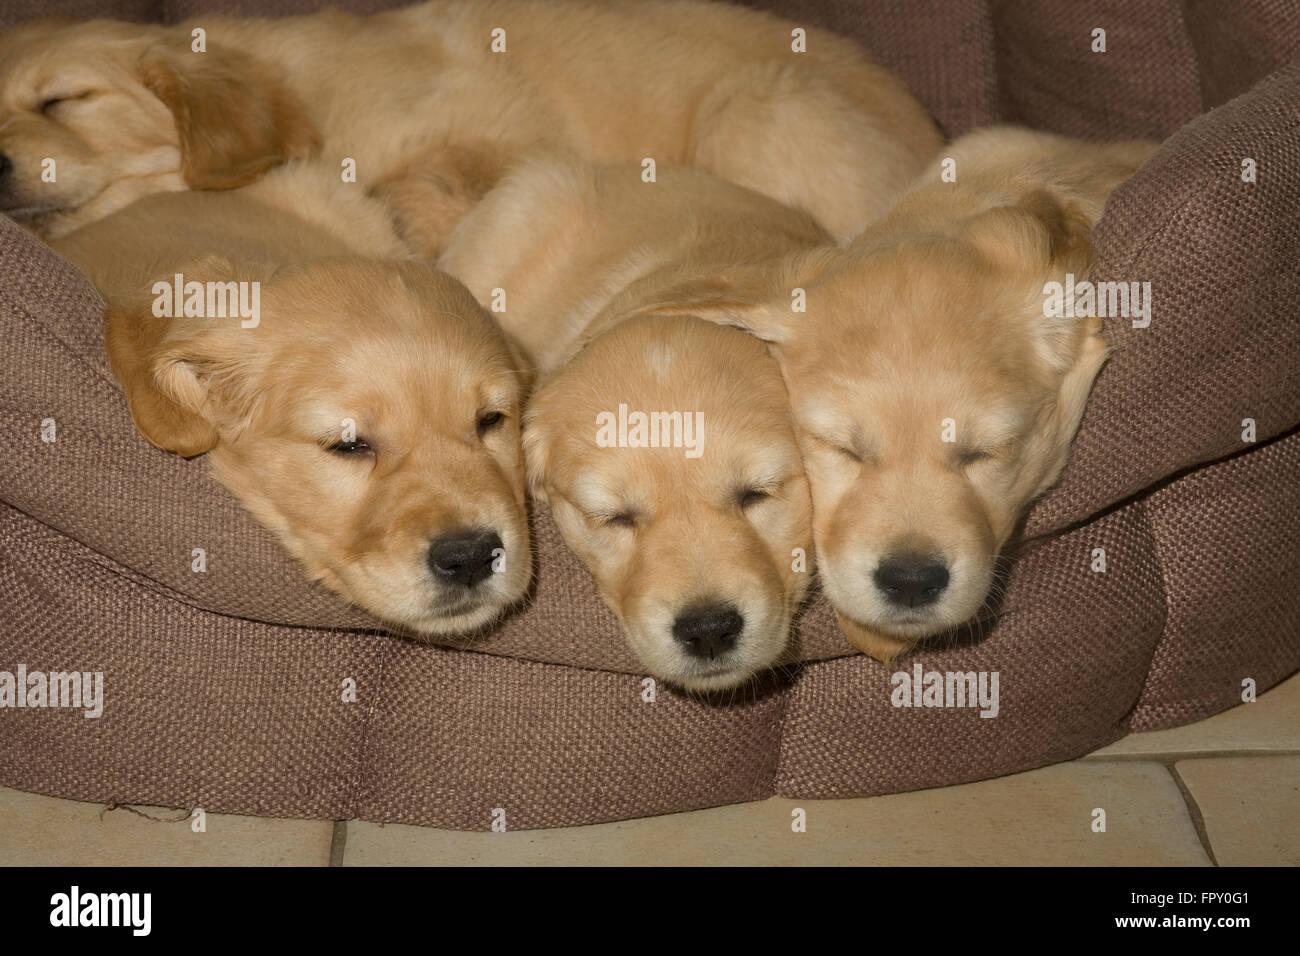 sleepy golden retriever puppies in soft basket - Stock Image